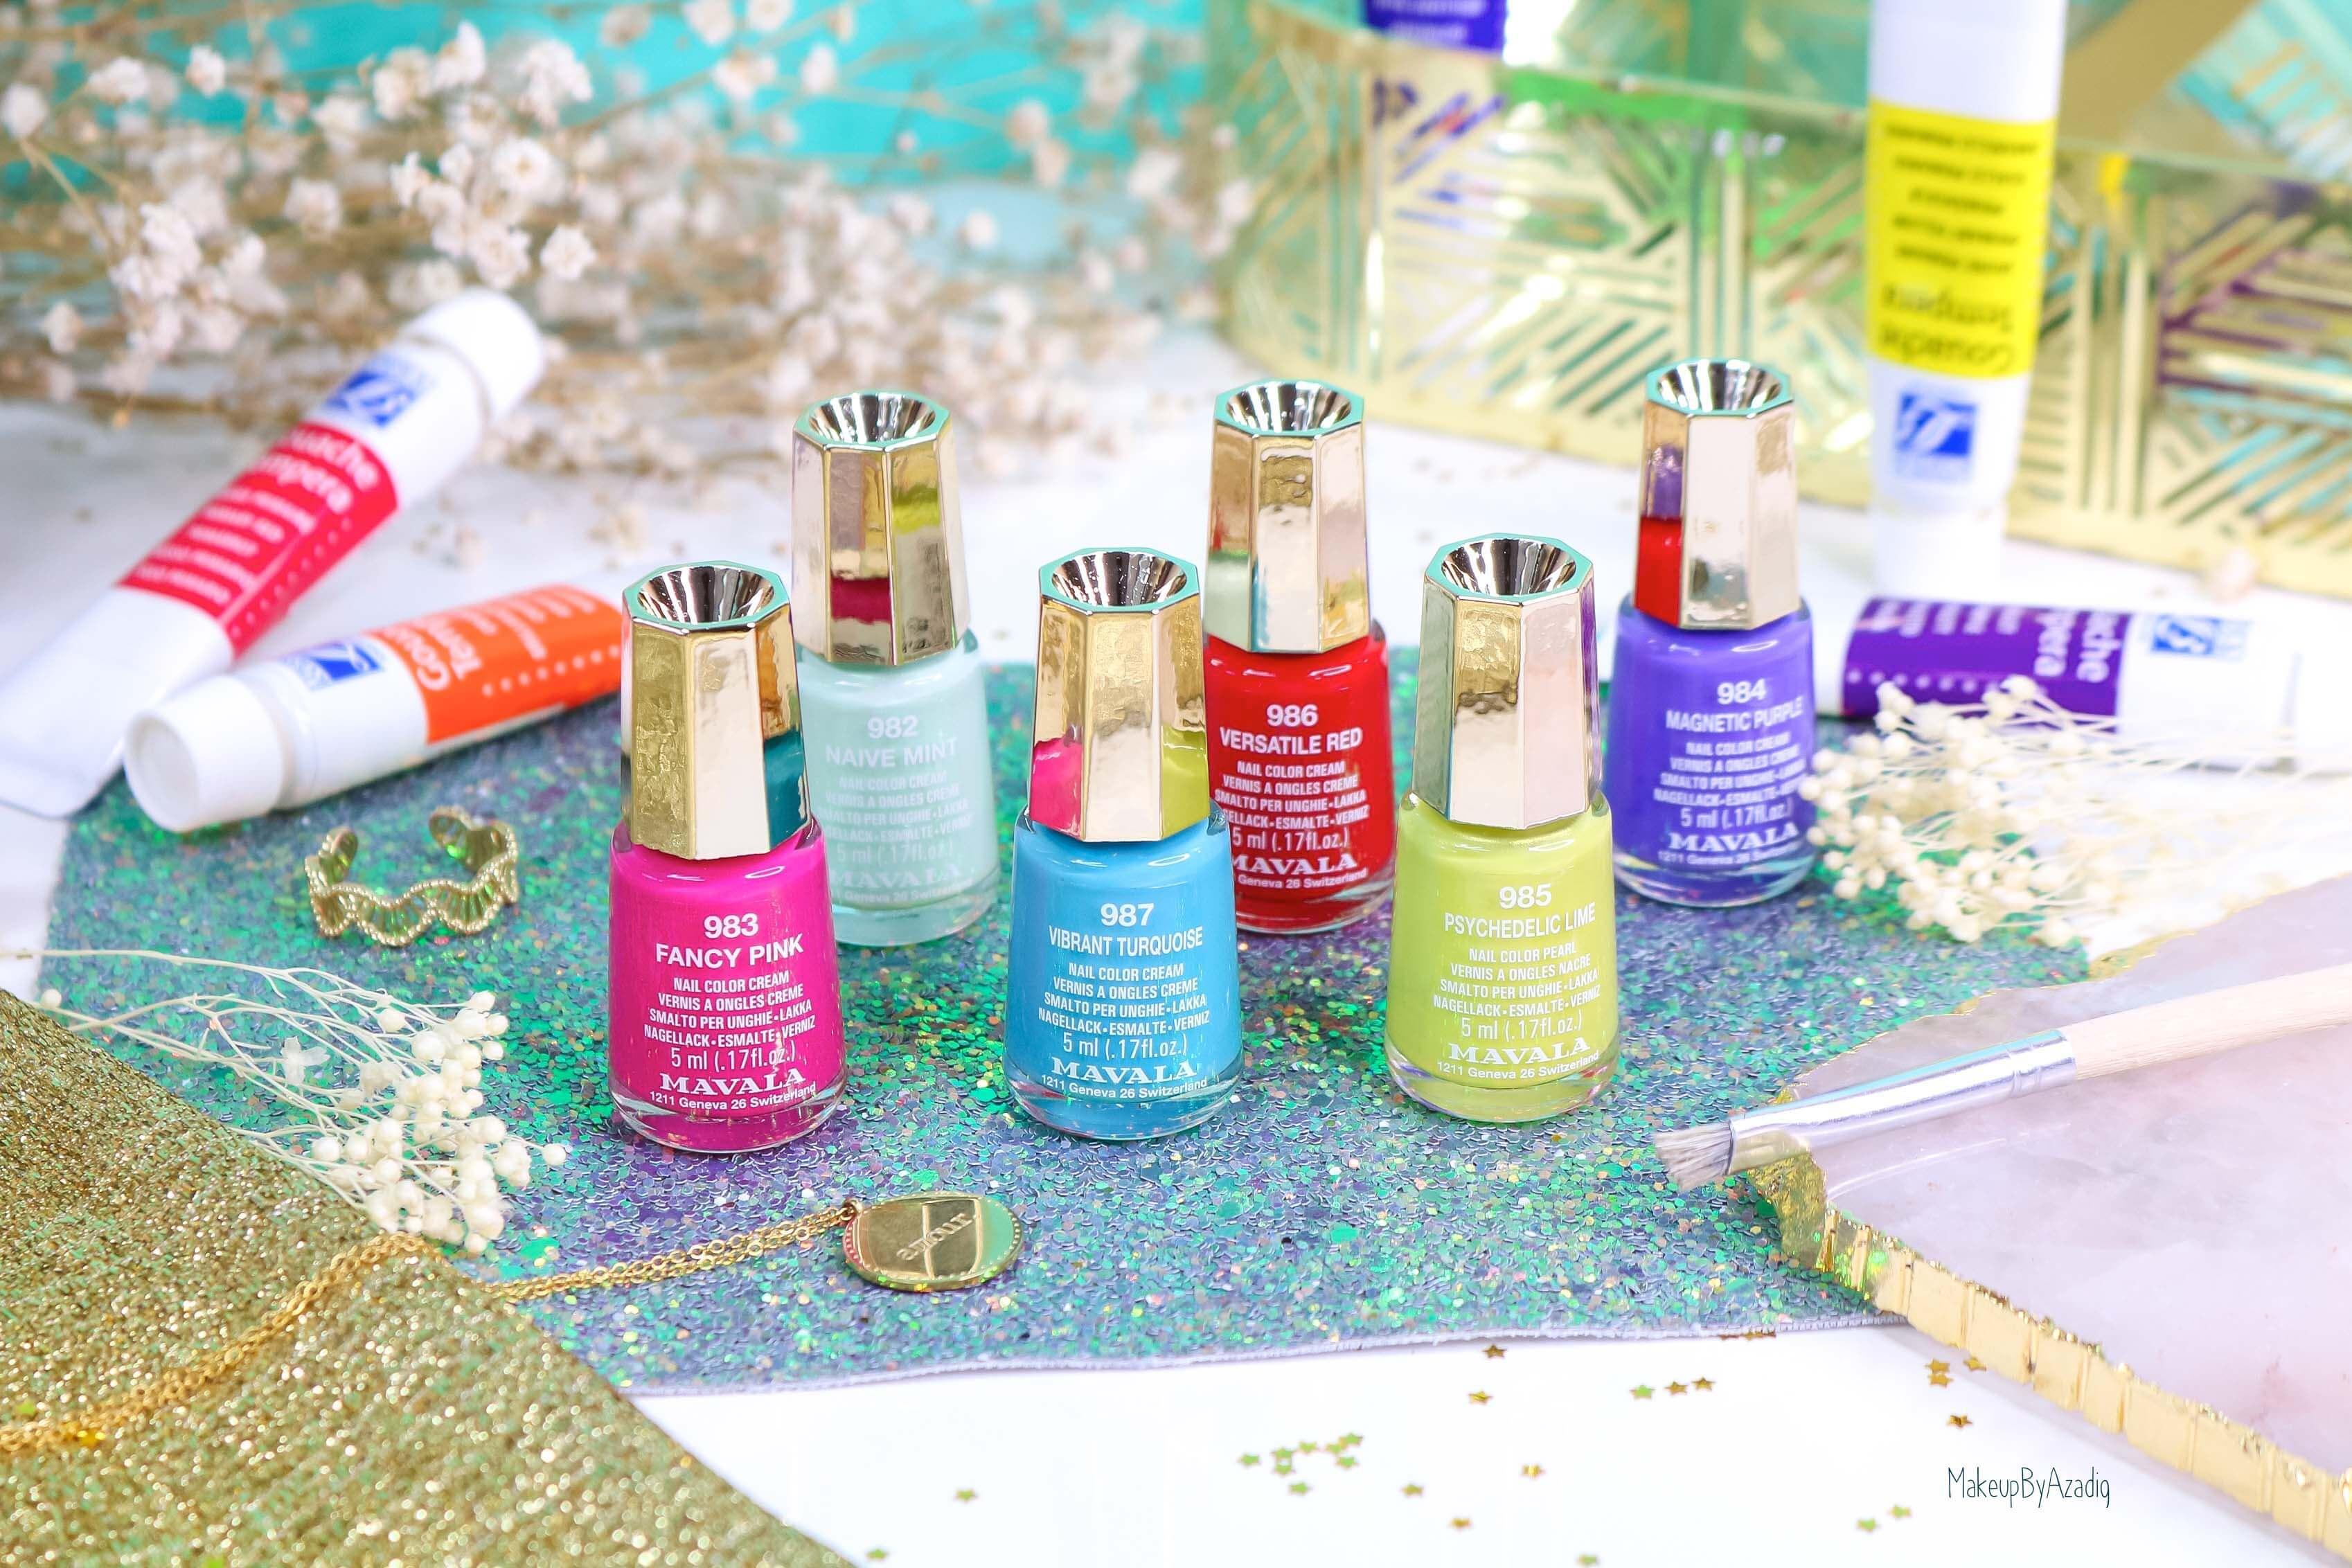 revue-collection-vernis-mavala-nails-dash-splash-ete-2019-bleu-orange-makeupbyazadig-swatch-avis-prix-miniature